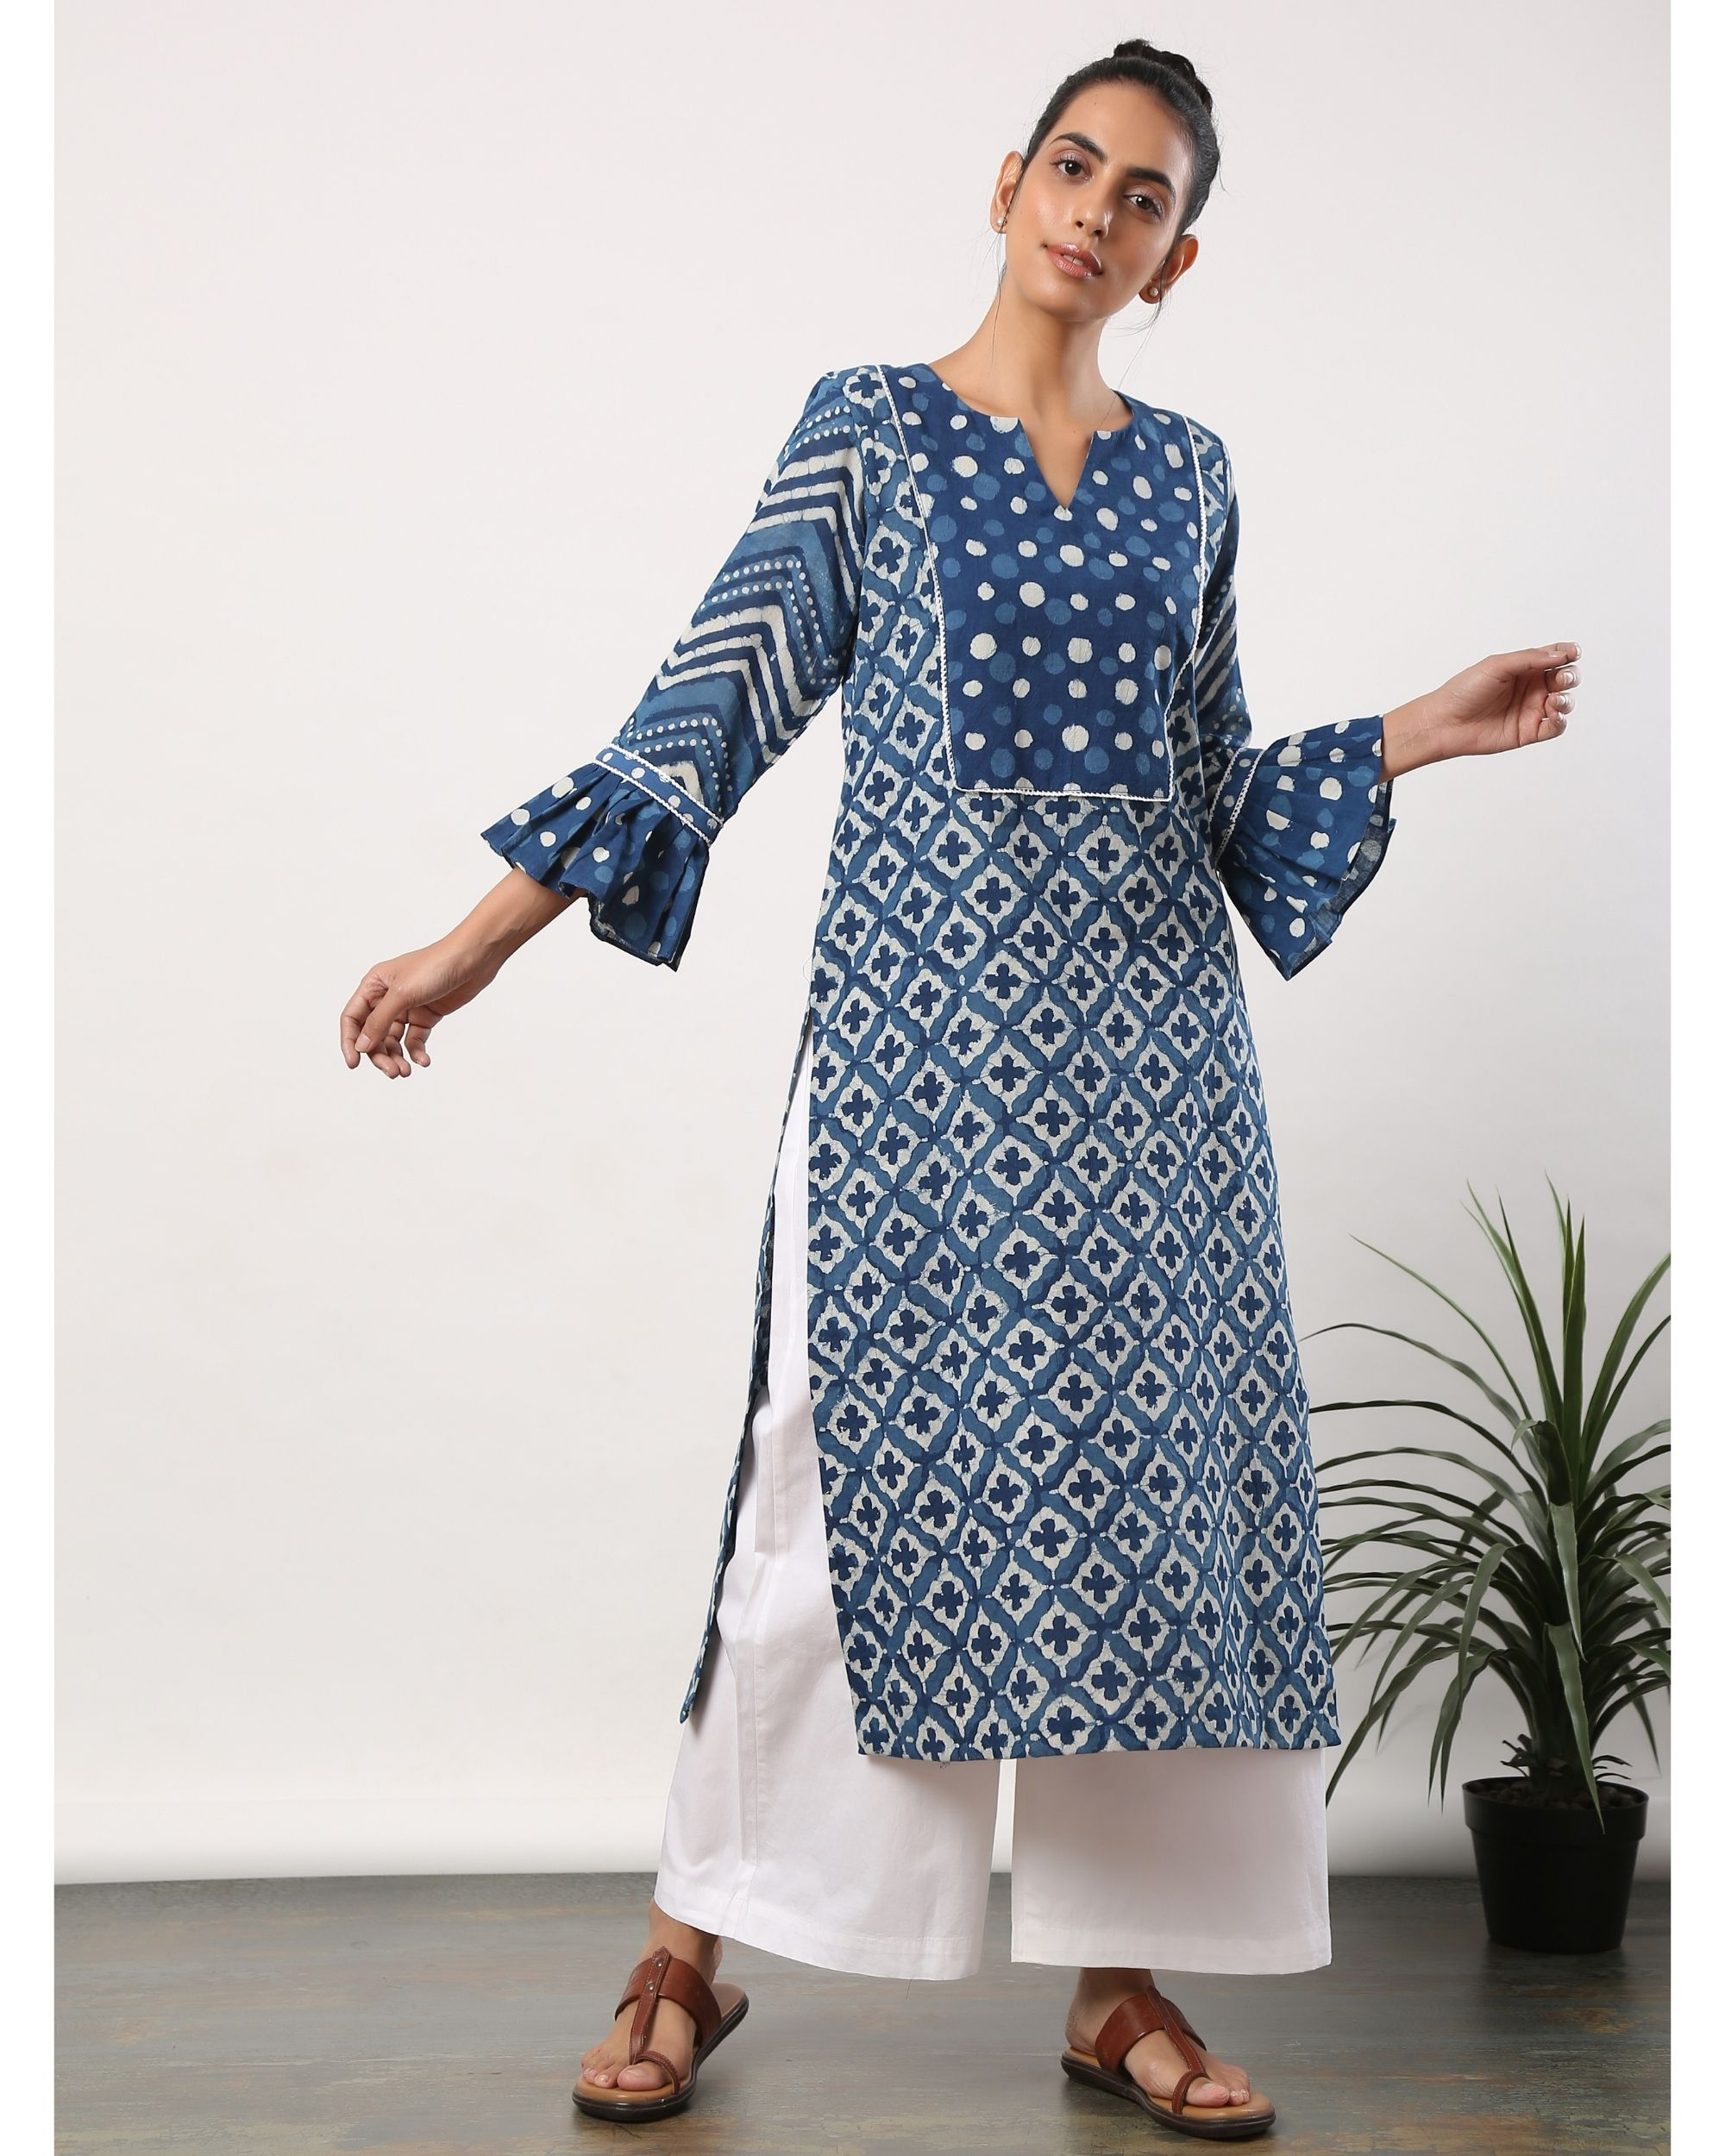 Indigo motif printed yoke kurta with frilled sleeves